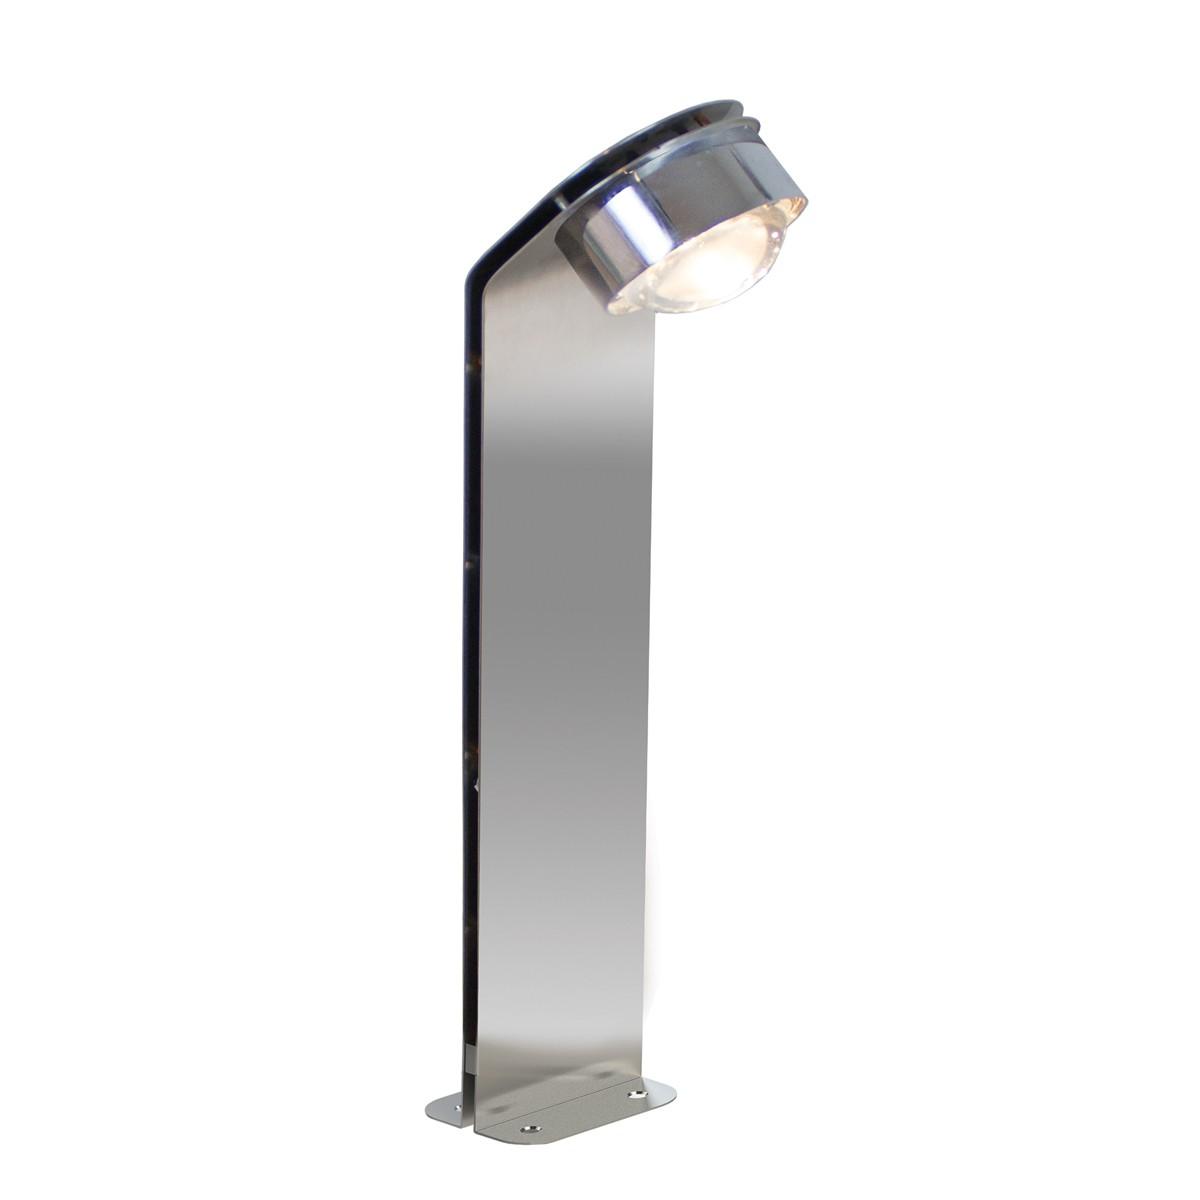 Top Light Puk Maxx Way II LED Pollerleuchte